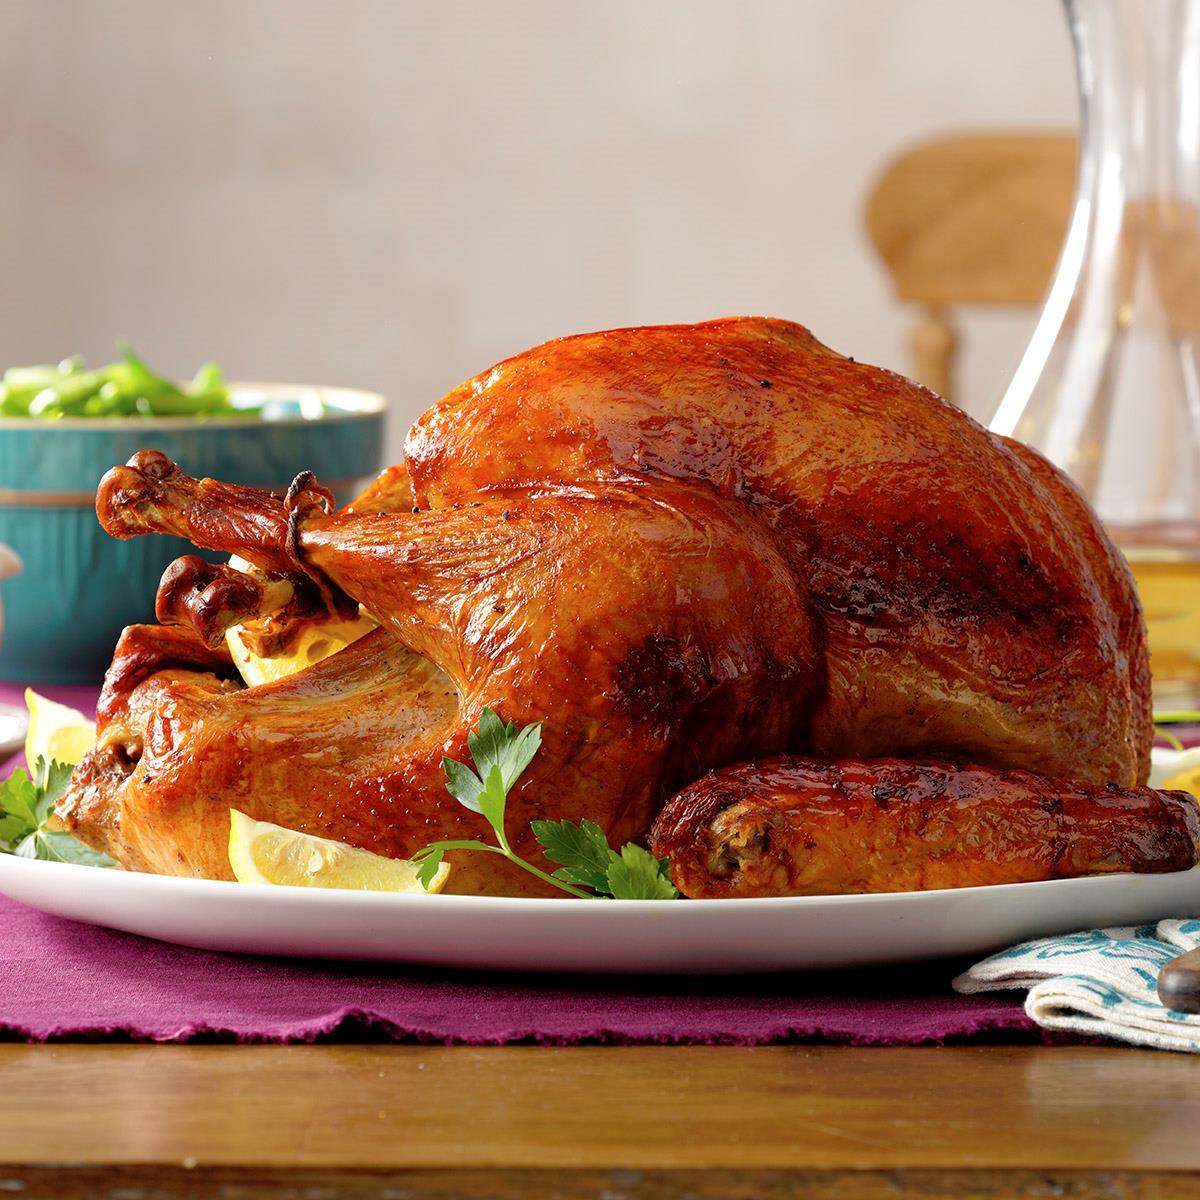 Marinated-Thanksgiving-Turkey_EXPS_THN17_1316_B06_15_5b.jpg